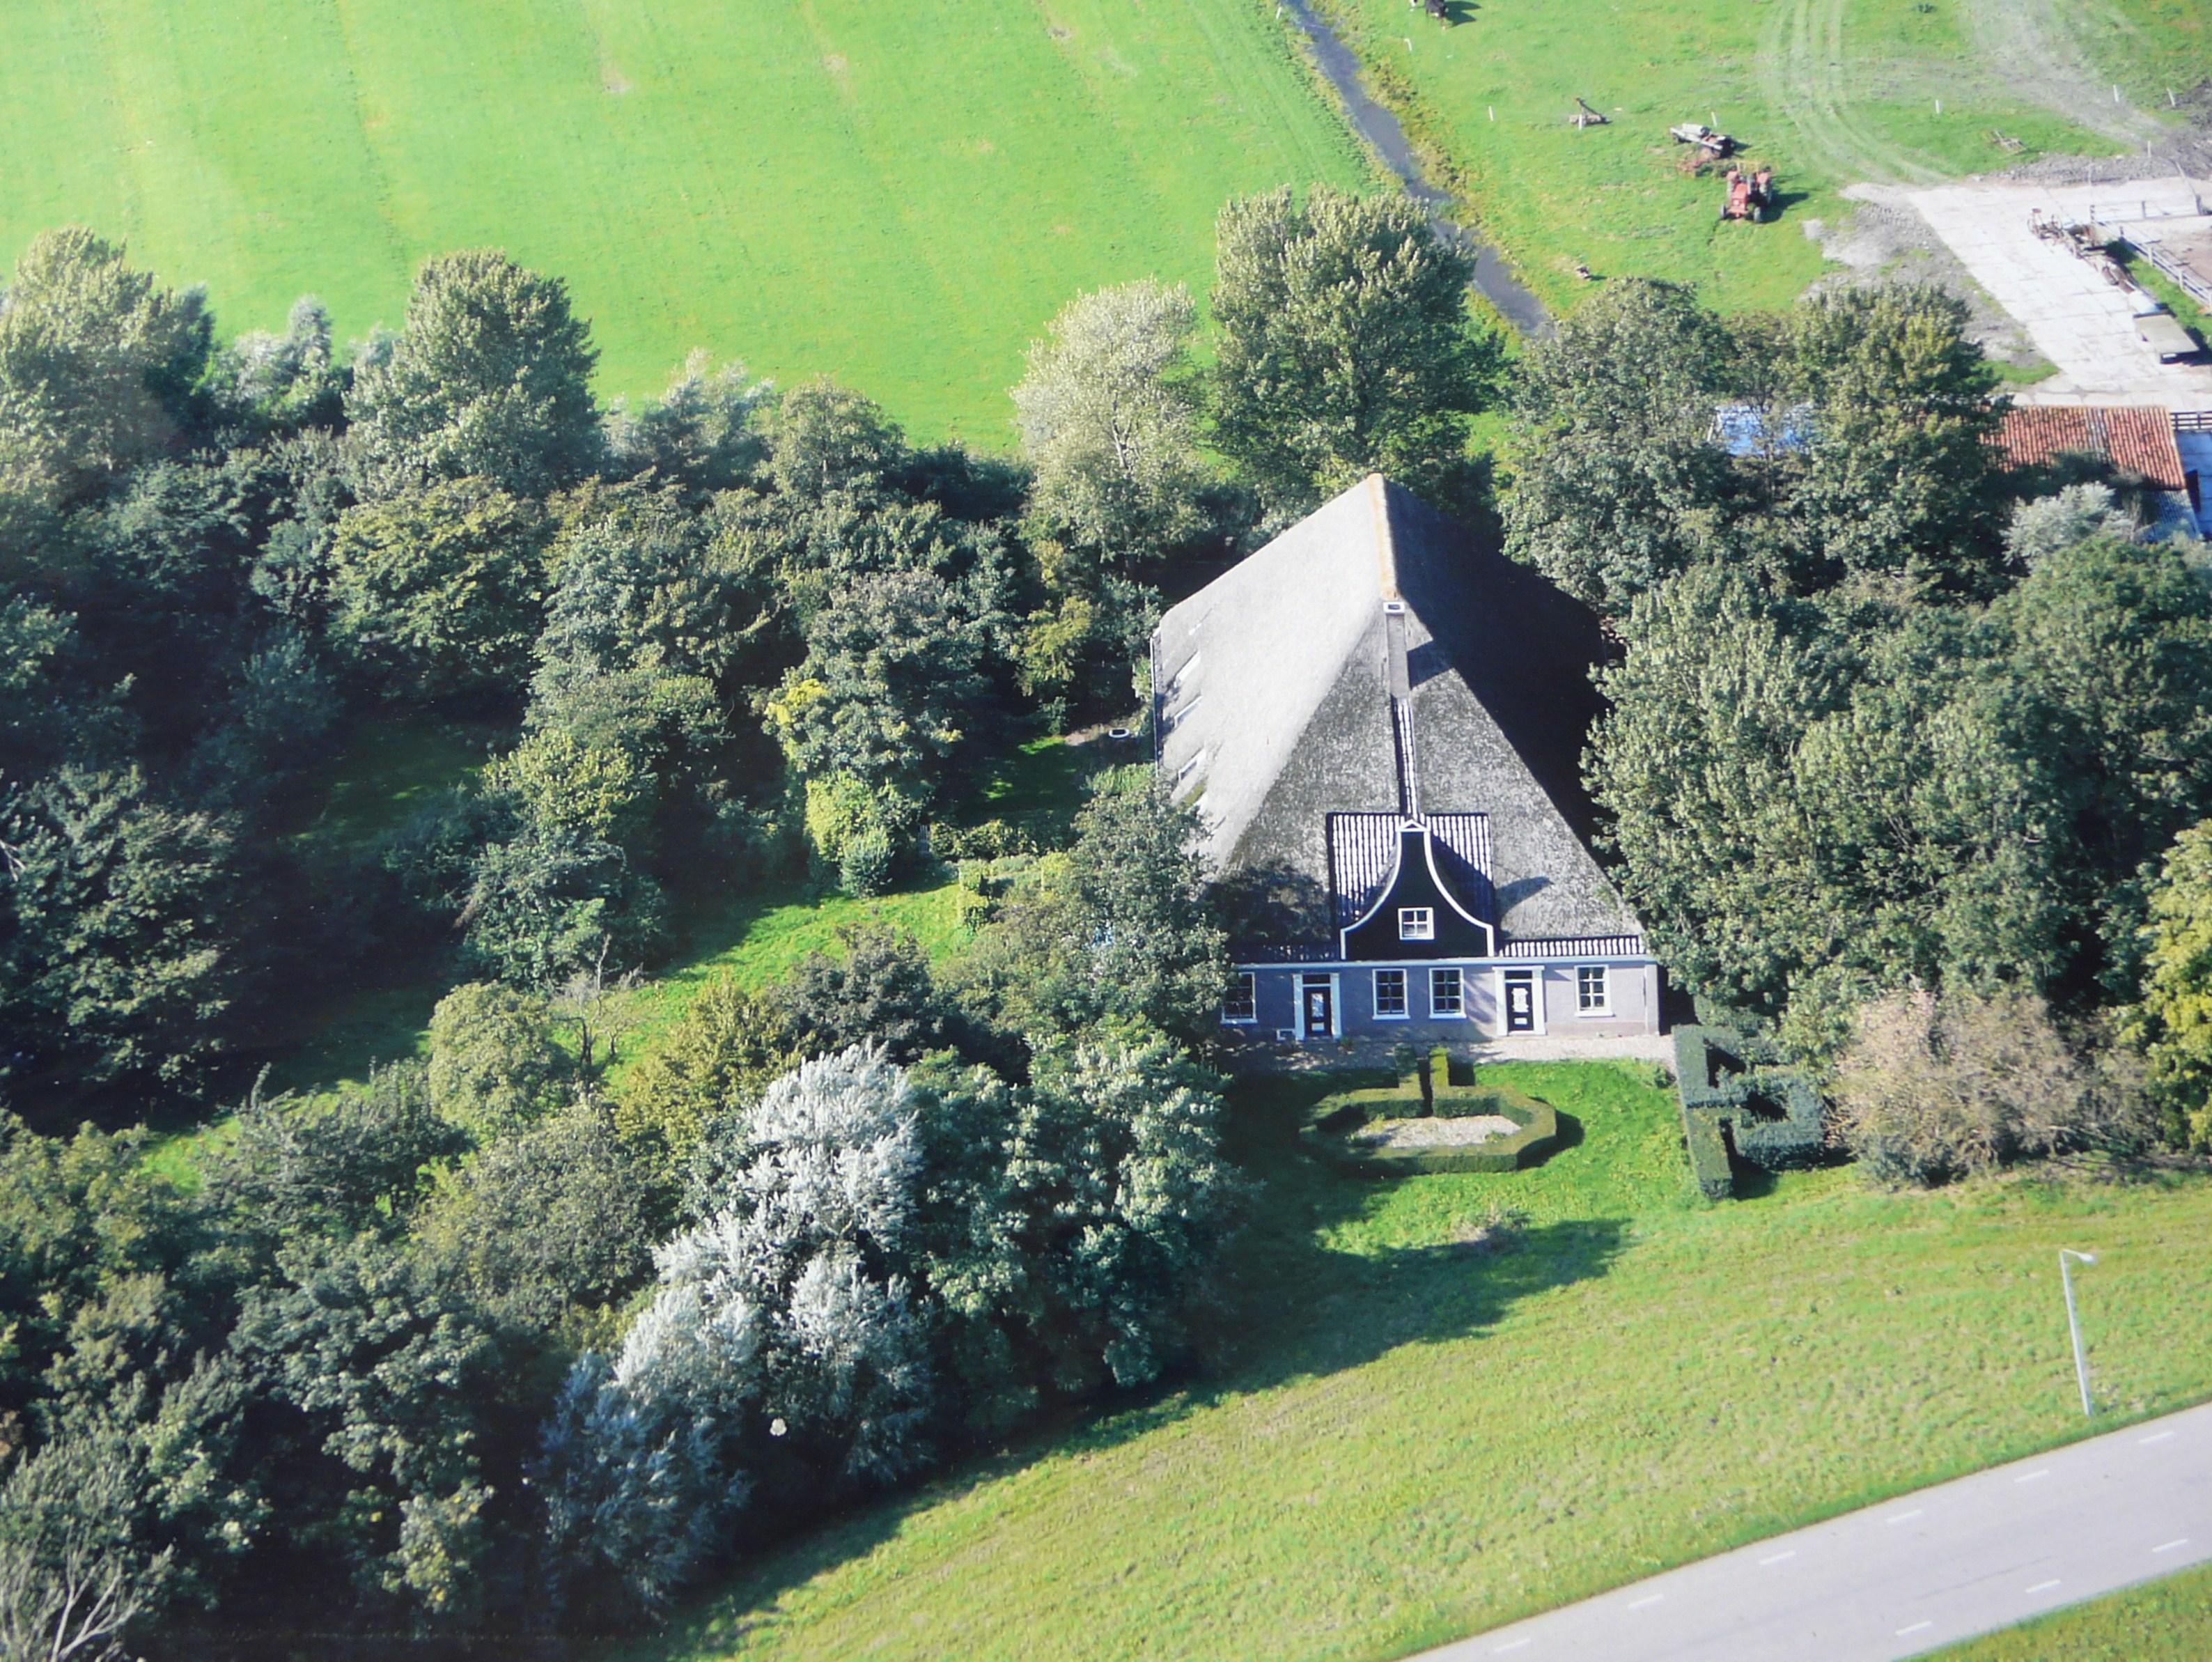 Te koop westfriesedijk 166 kolhorn hoekstra en van for Dubbele bewoning boerderij